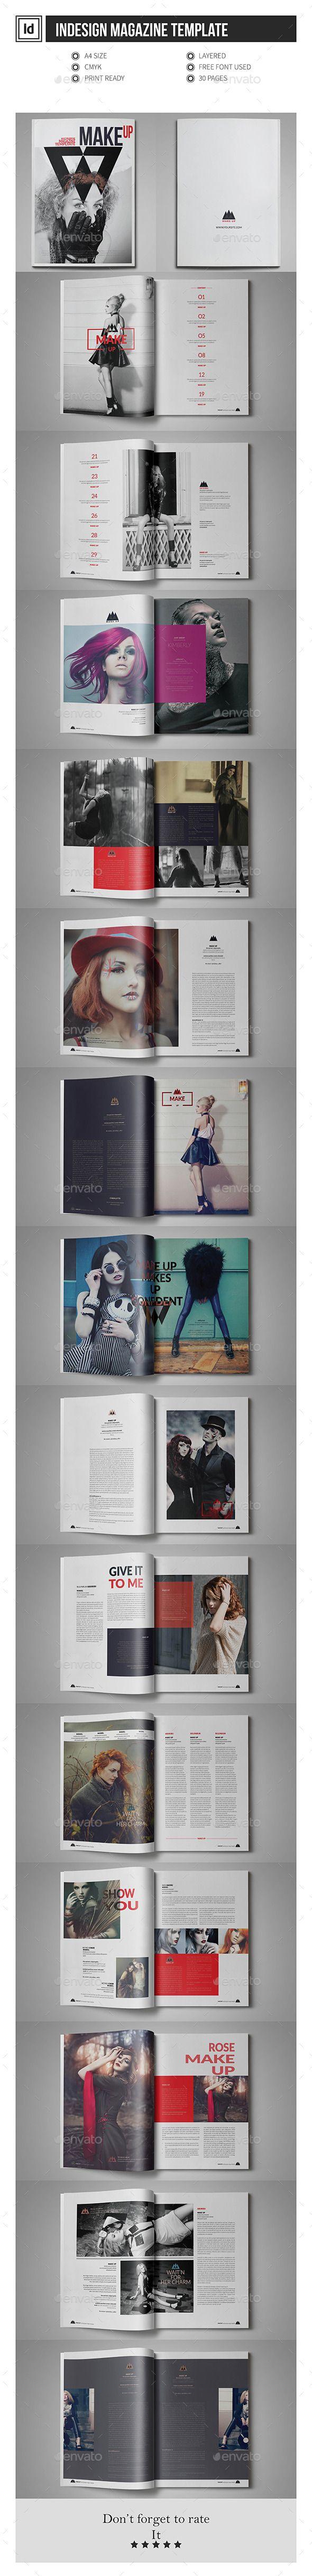 Multipurpose InDesign Magazine Template #design Download: http://graphicriver.net/item/multipurpose-indesign-magazine-template/11904395?ref=ksioks